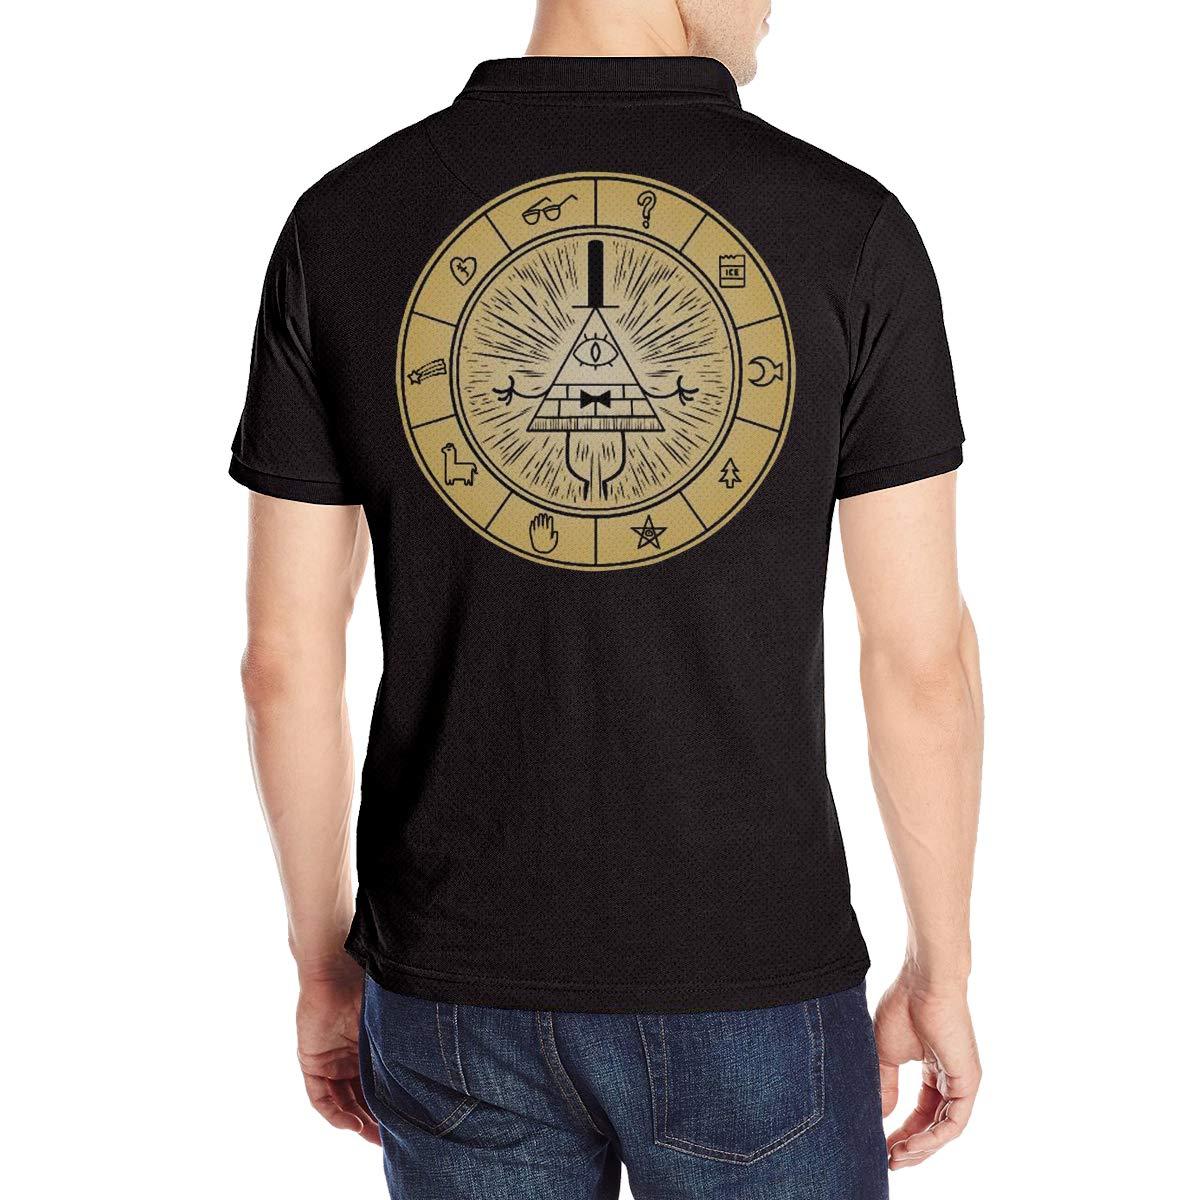 Arilce Gravity Falls Vintage Men Polo Shirt Short Sleeve Lapel Blouse Black